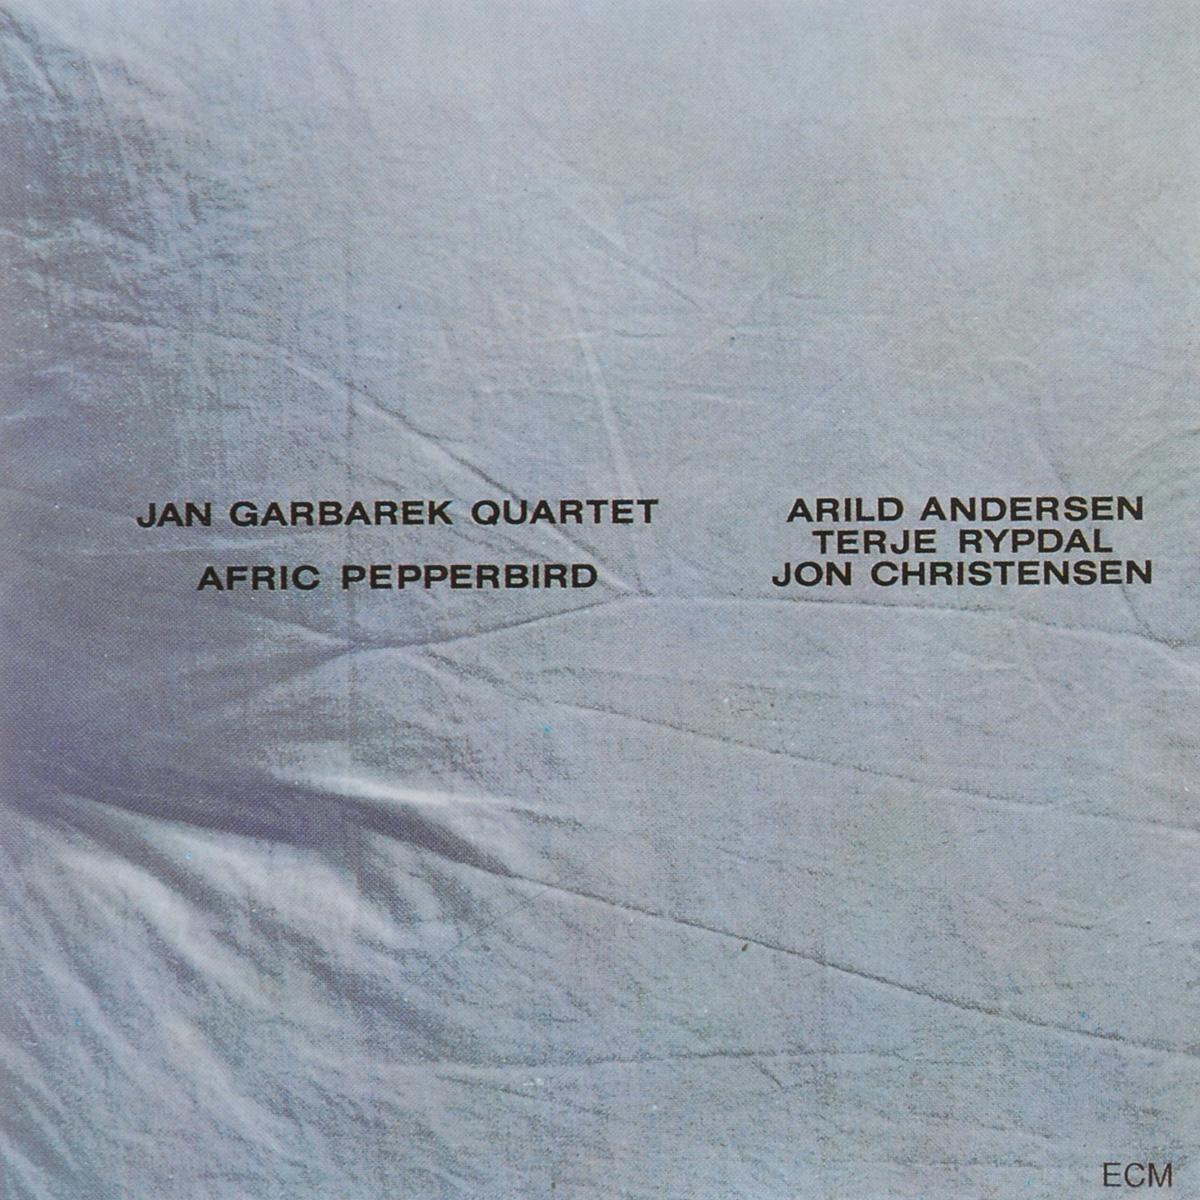 Jan Garbarek Quartet Jan Garbarek Quartet. Afric Pepperbird jan garbarek jan garbarek i took up the runes